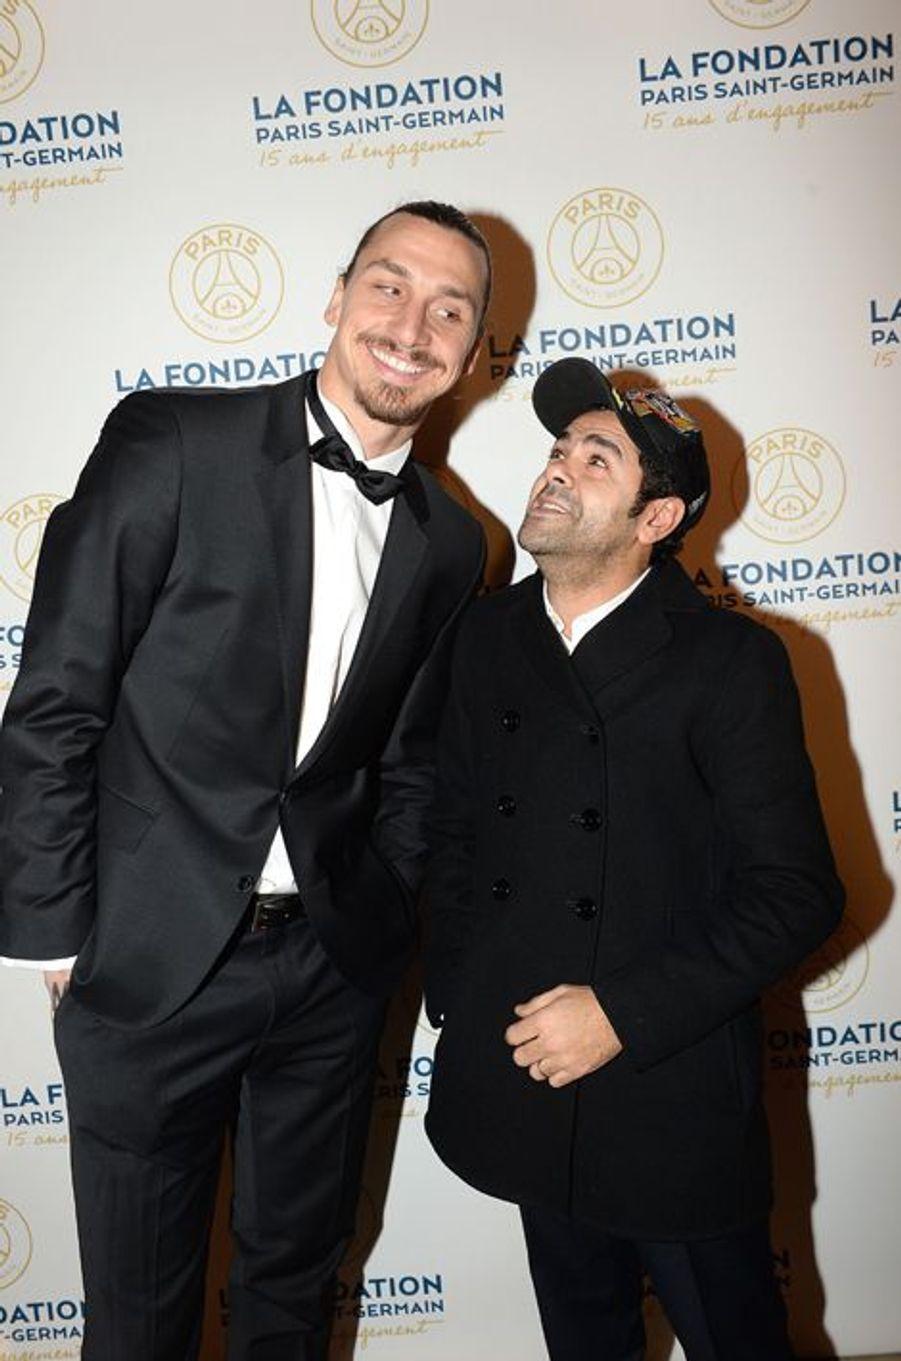 Zlatan Ibrahimović et Jamel Debbouze au gala de la Fondation PGS